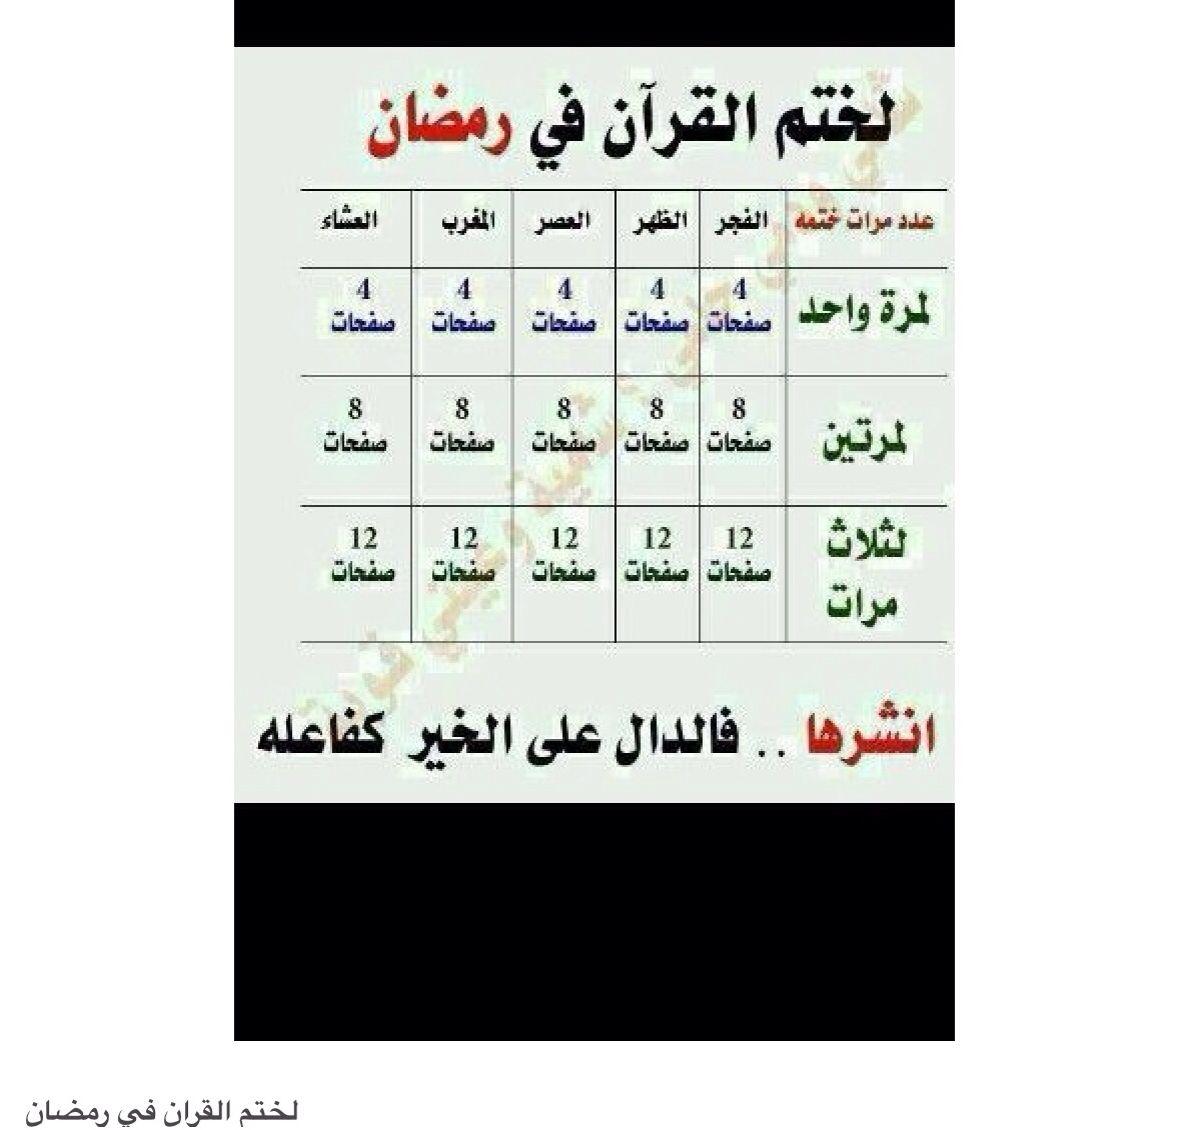 ختمه القران في رمضان Eid Favours Ramadan Words